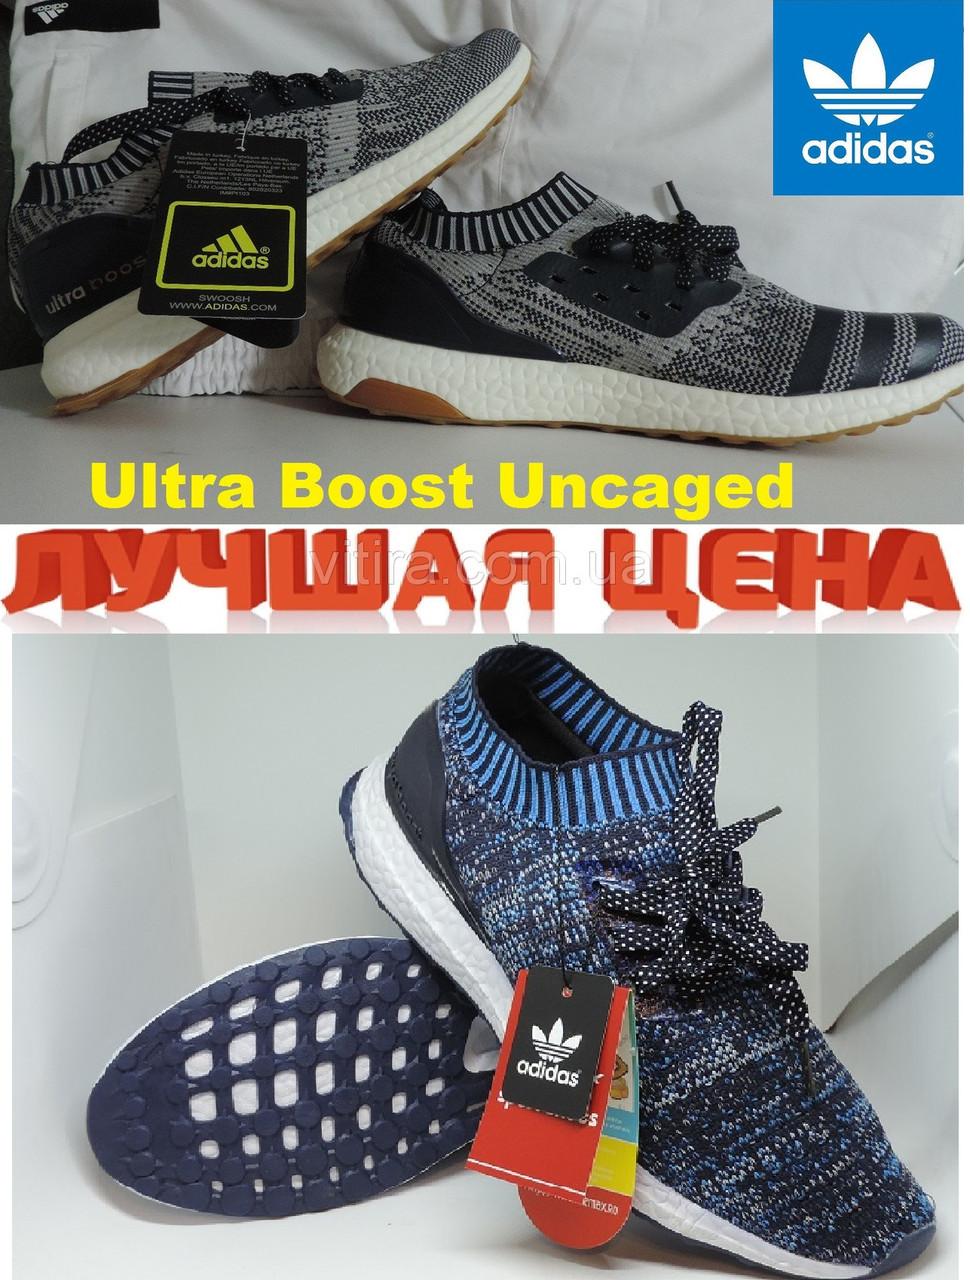 f6d1dc8d Мужские кроссовки Адидас Ультра Буст (Adidas Ultra Boost Uncaged). Турция,  реплика -